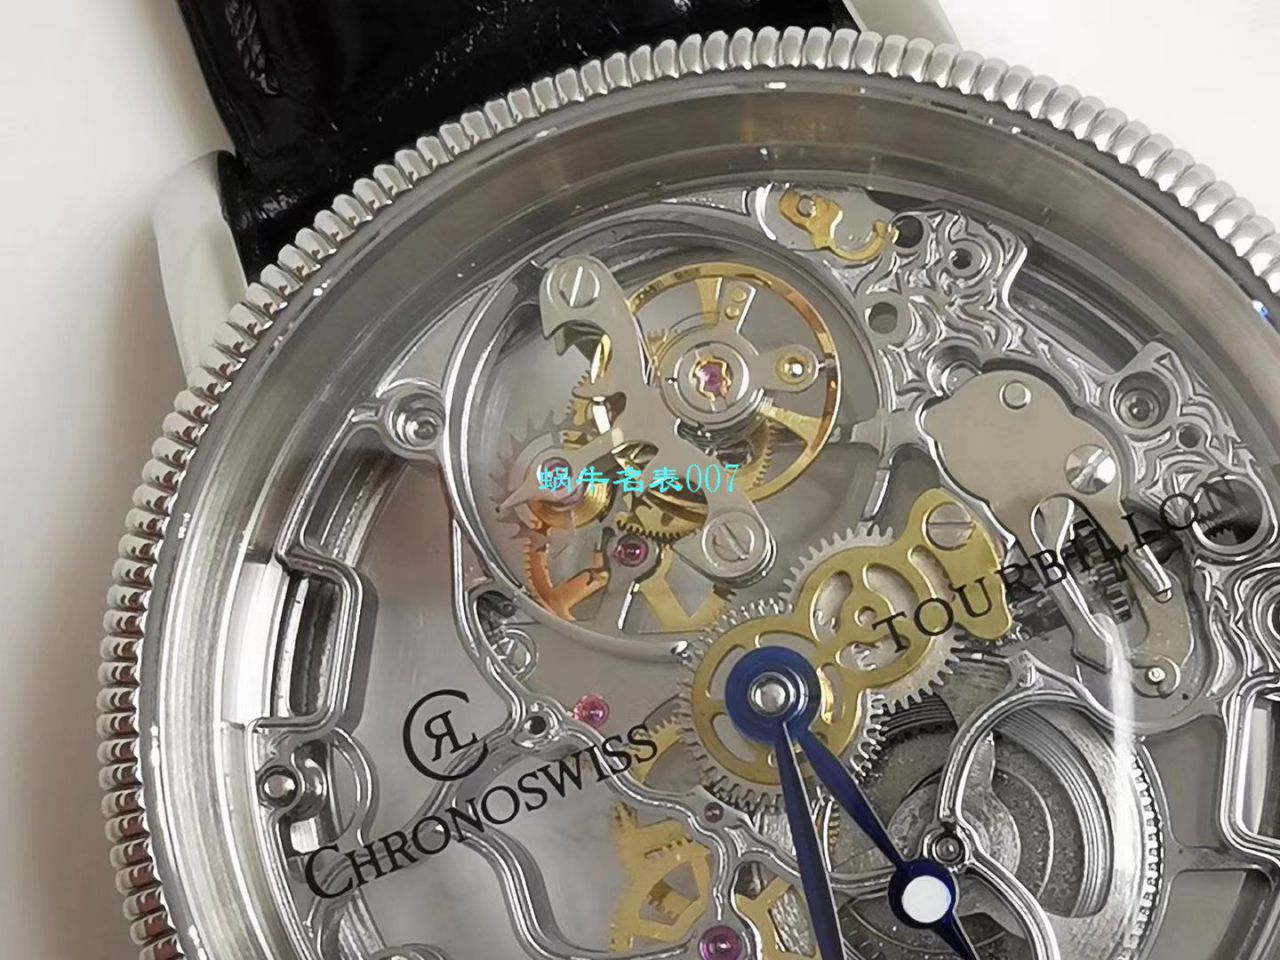 JB厂高仿瑞宝Chronoswiss镂空陀飞轮 腕表